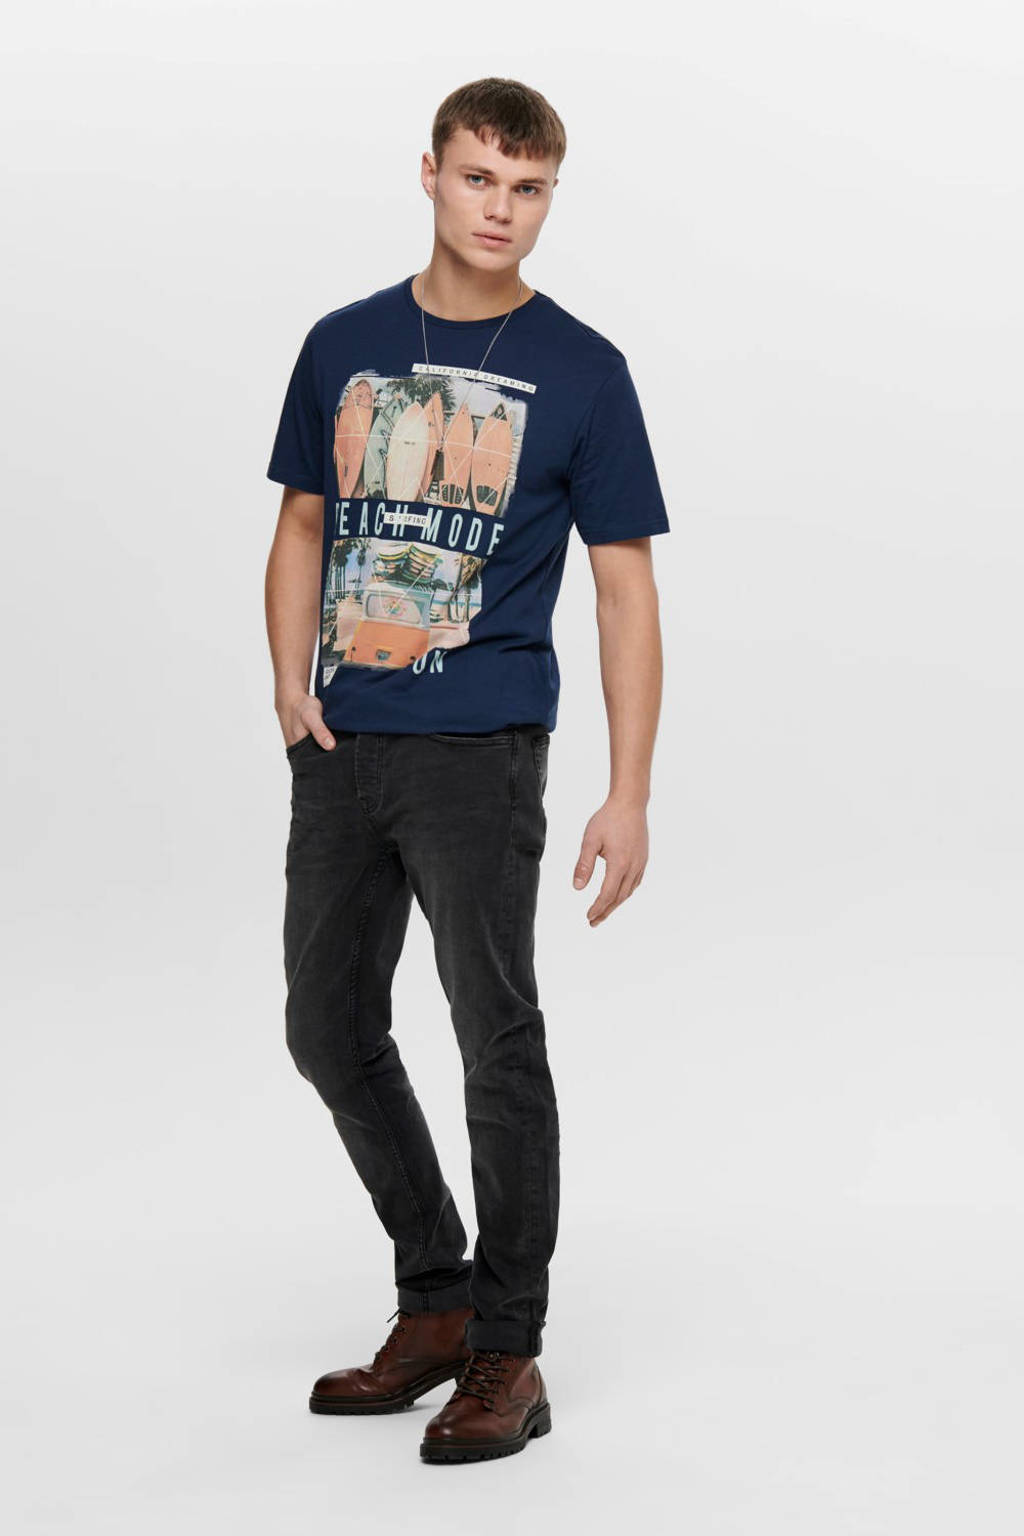 ONLY & SONS slim fit jeans Loom black denim 0447, Black Denim 0447